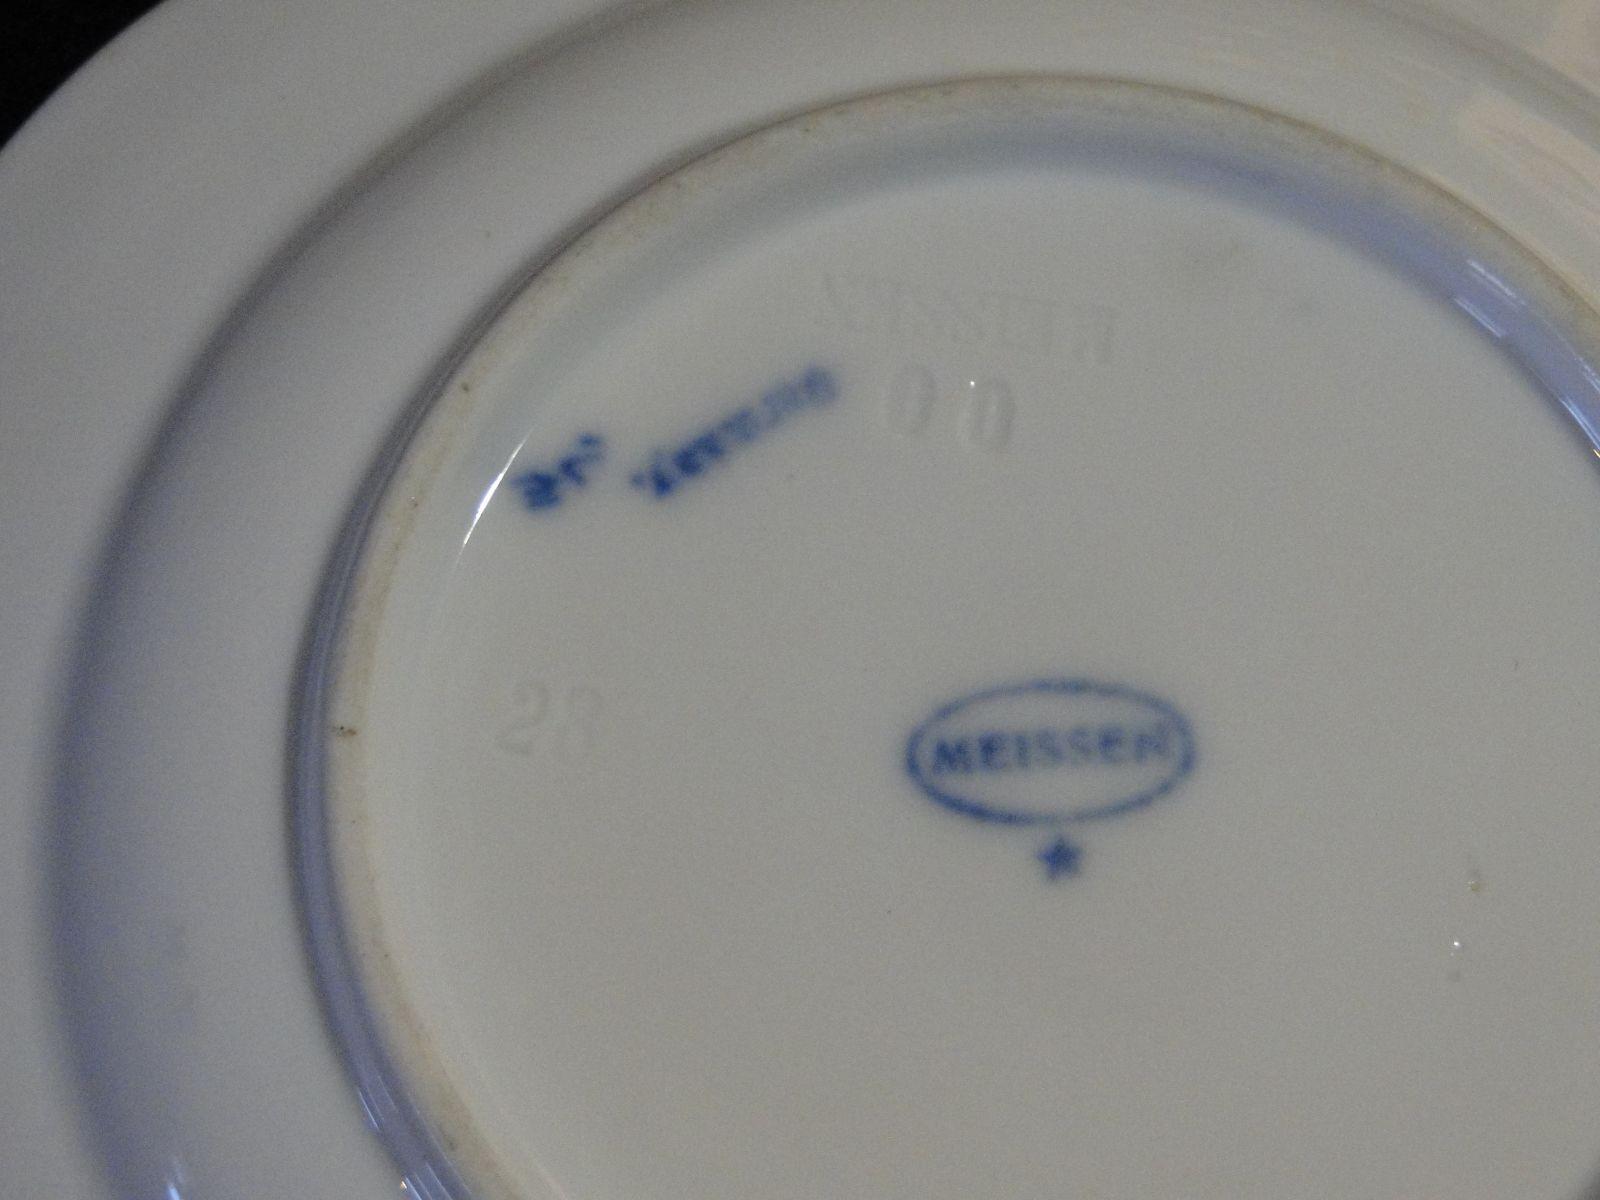 DSC07529.JPG (1600�1200)